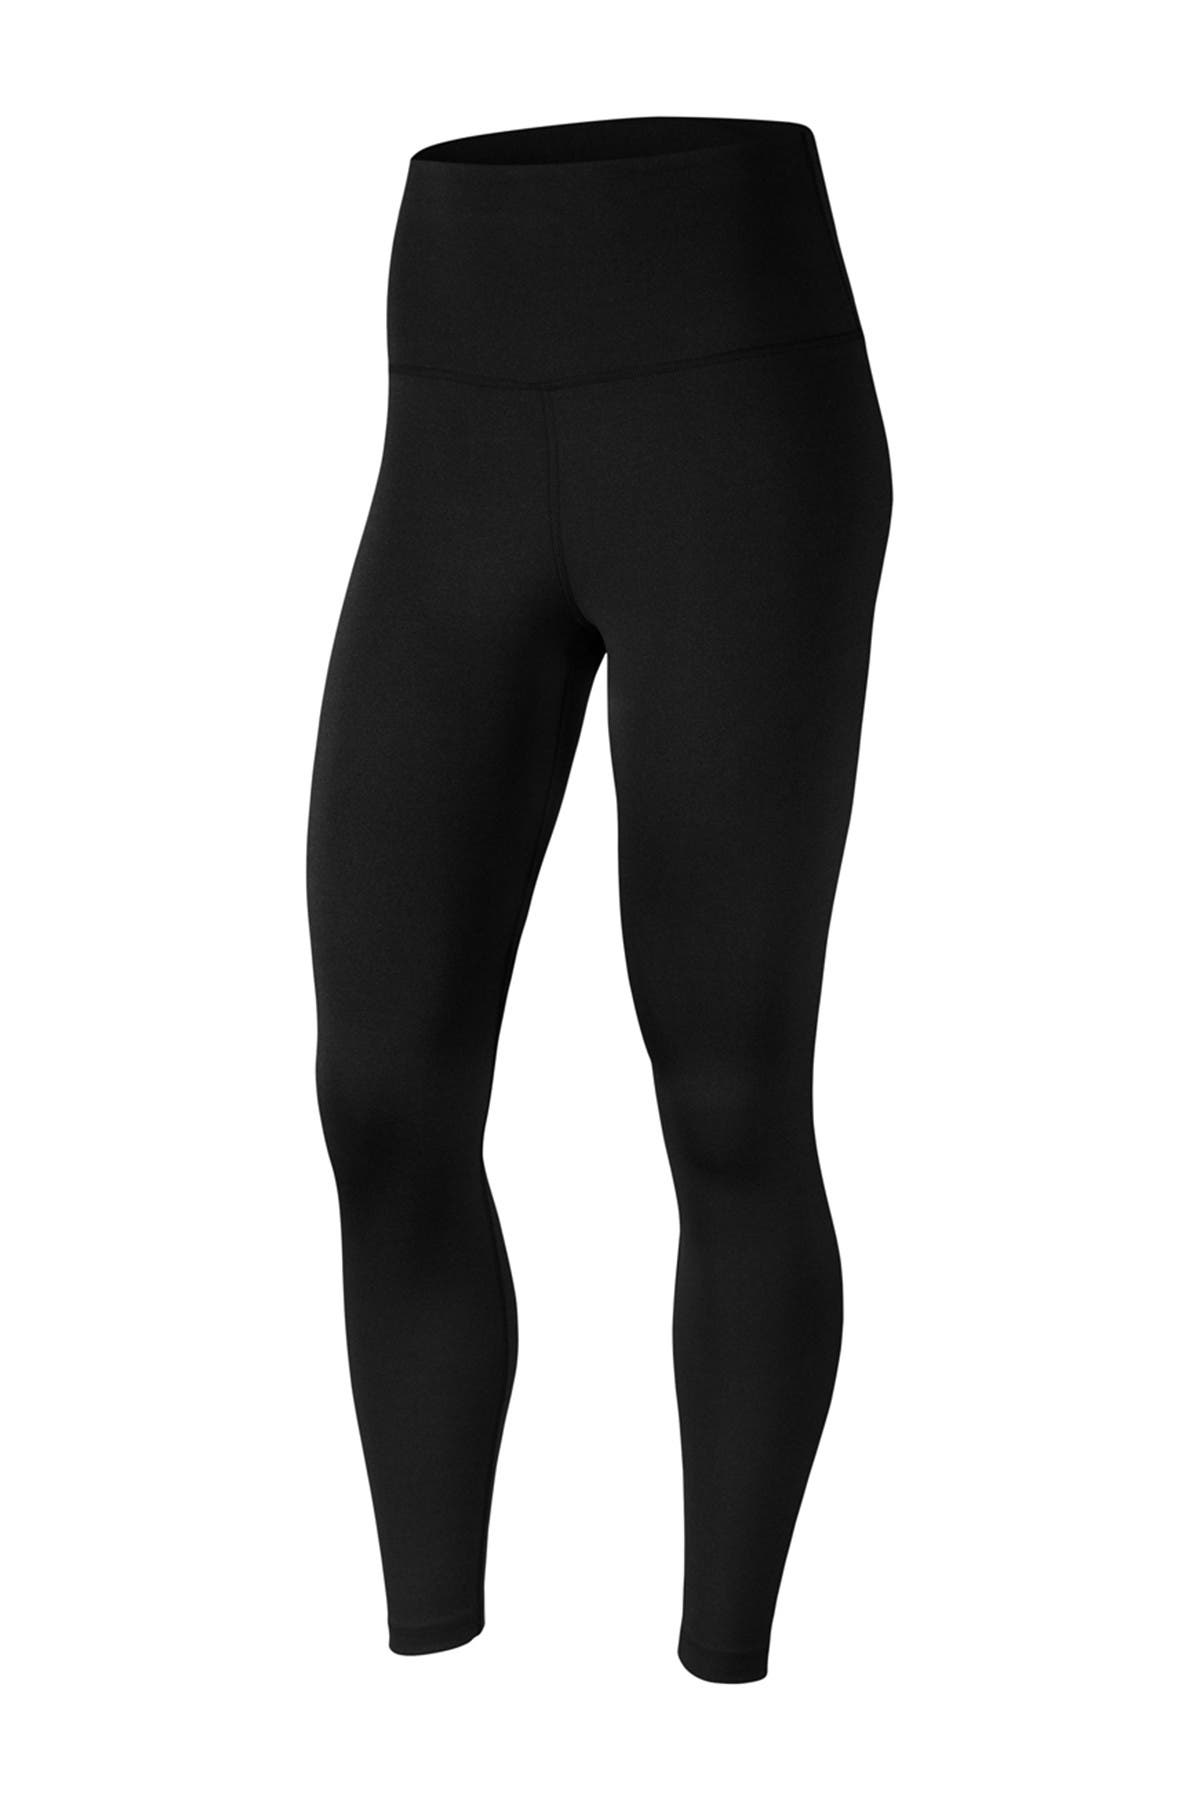 Image of Nike Yoga 7/8 Tights